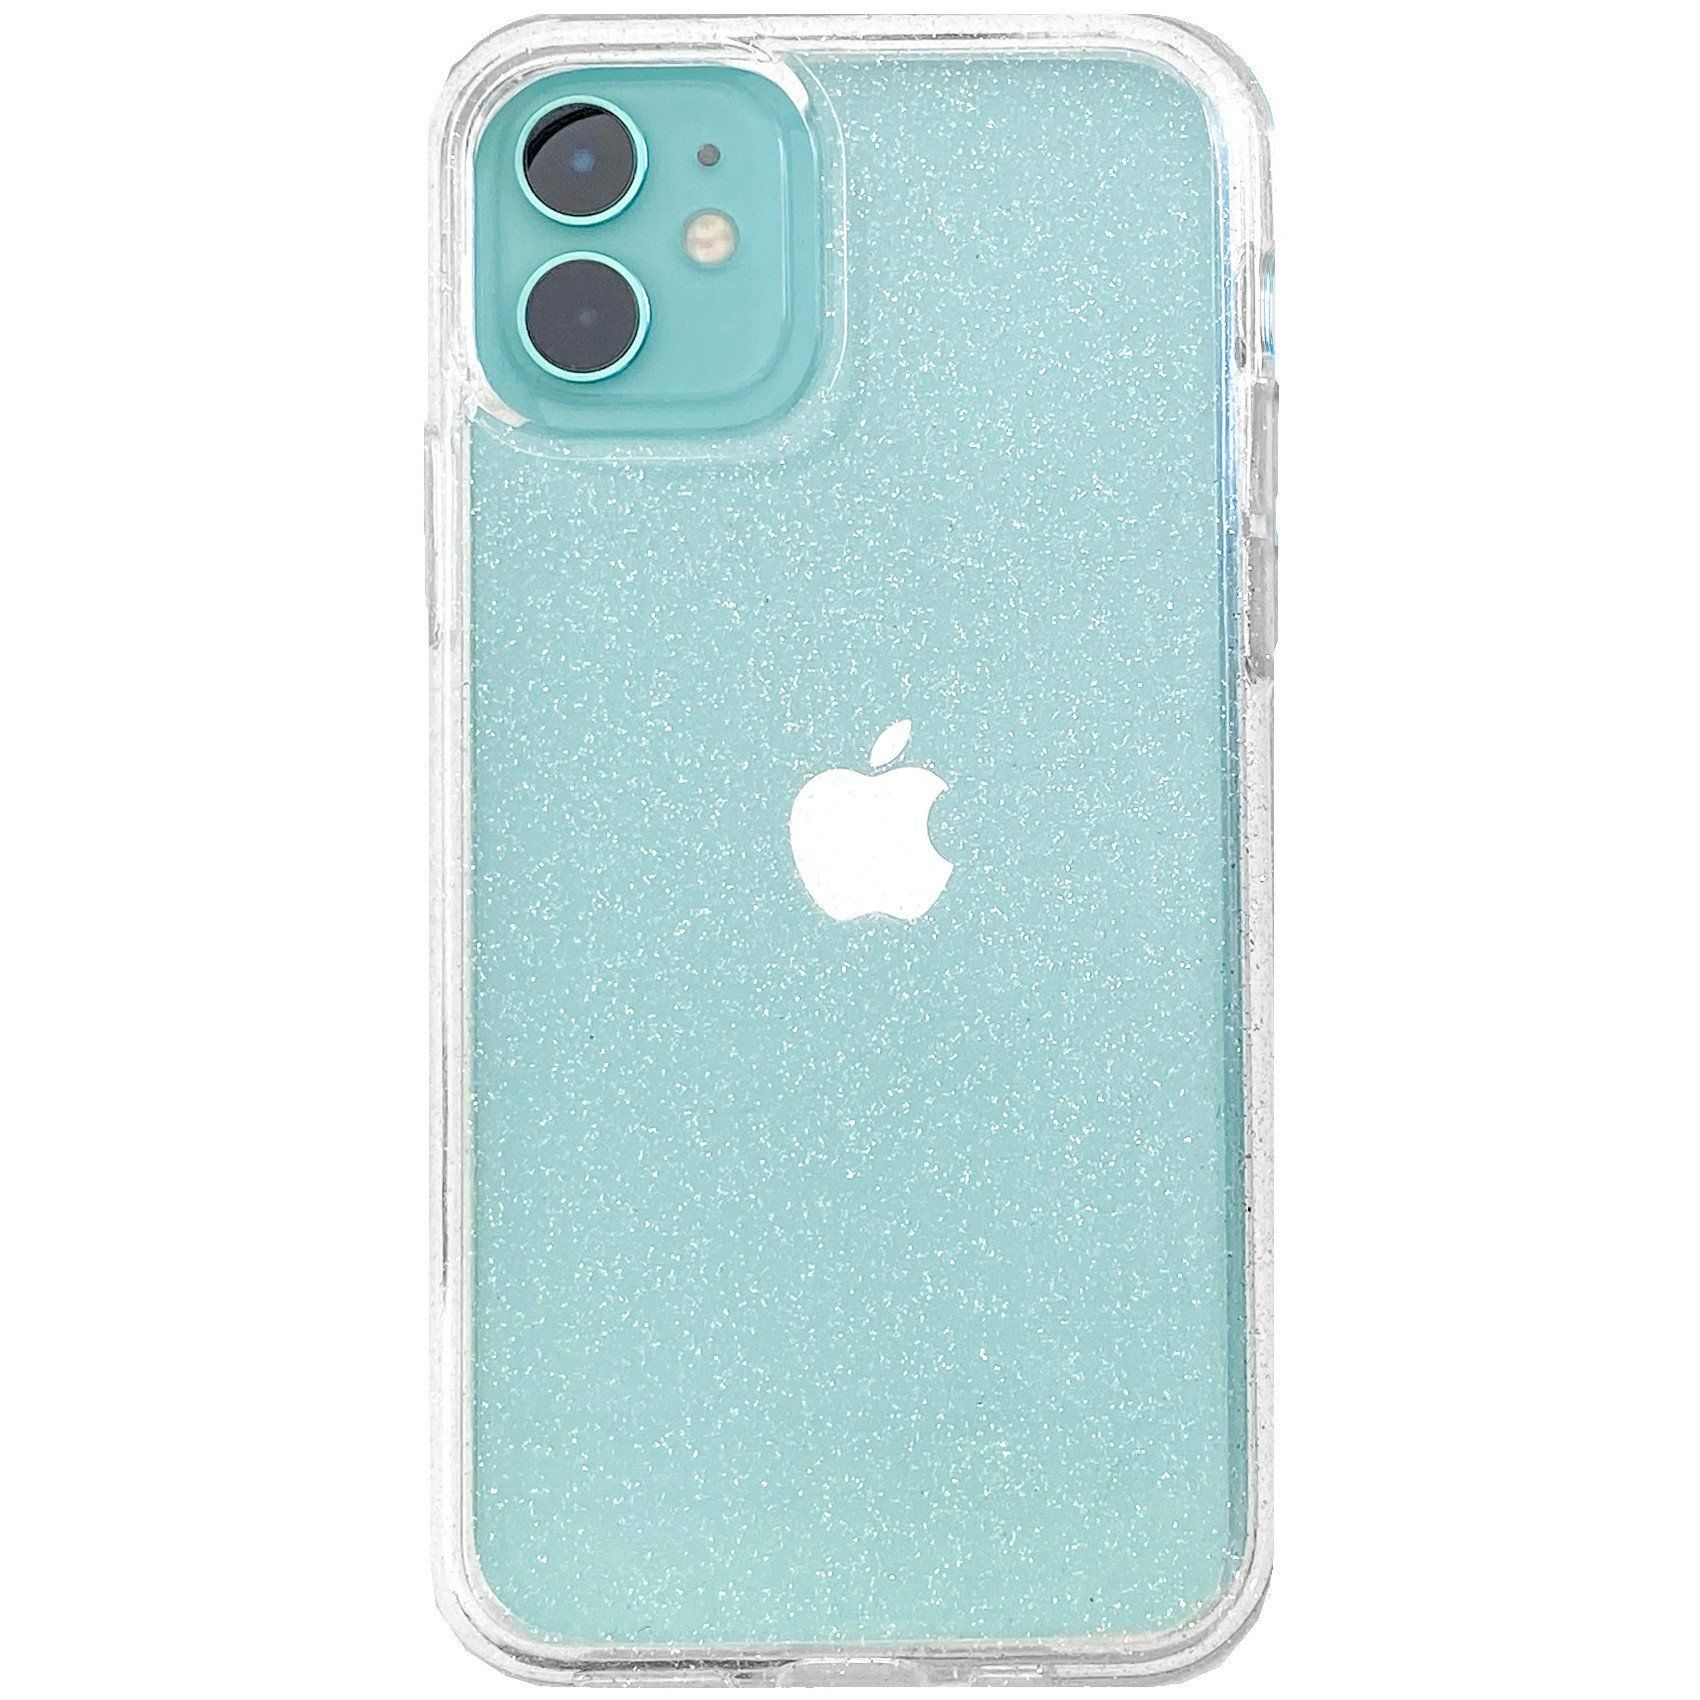 Iphone 11 Xr Shimmer Case Elemental Cases In 2020 Iphone Apple Phone Case Iphone Phone Cases